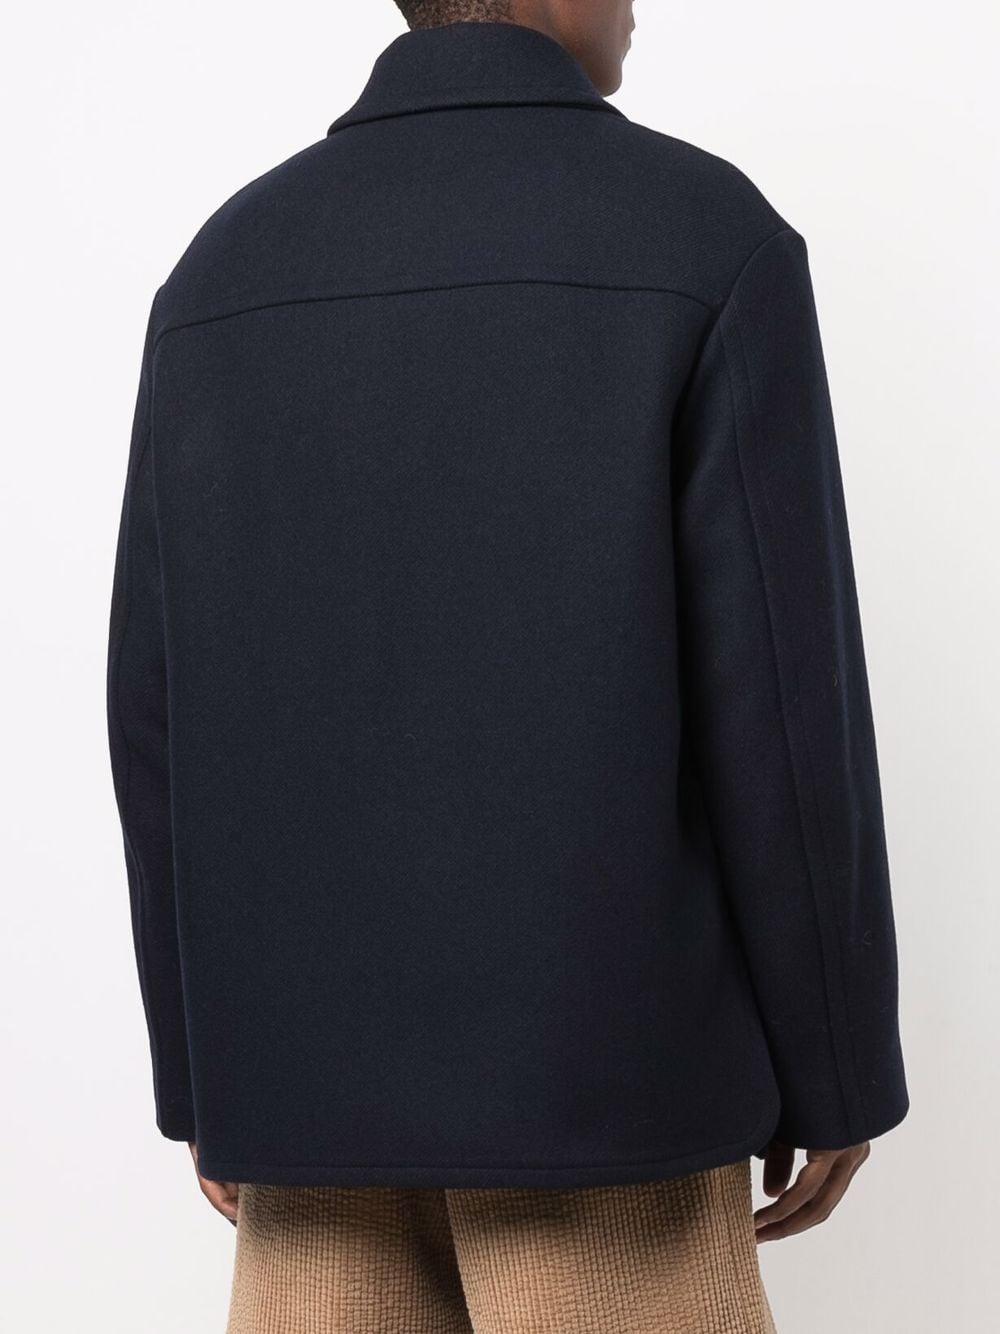 giaccone oversize con bottoni DRIES VAN NOTEN | Giaccone | VENDALBIS3197509